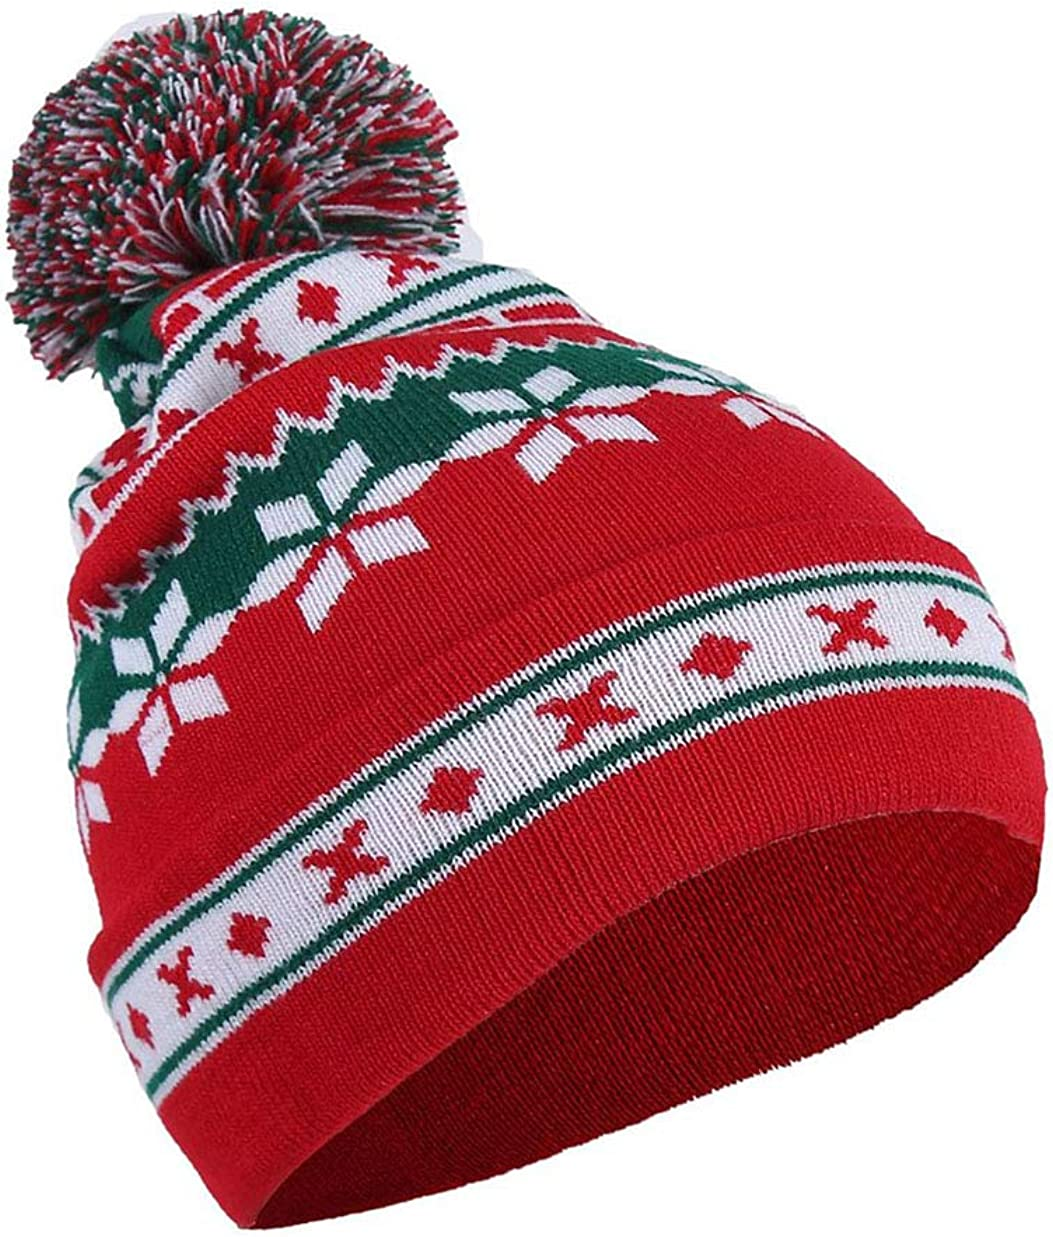 MHKECON Max 85% OFF Adult Christmas X-Mas Santa Holiday Sale SALE% OFF Winter Fashion Beani